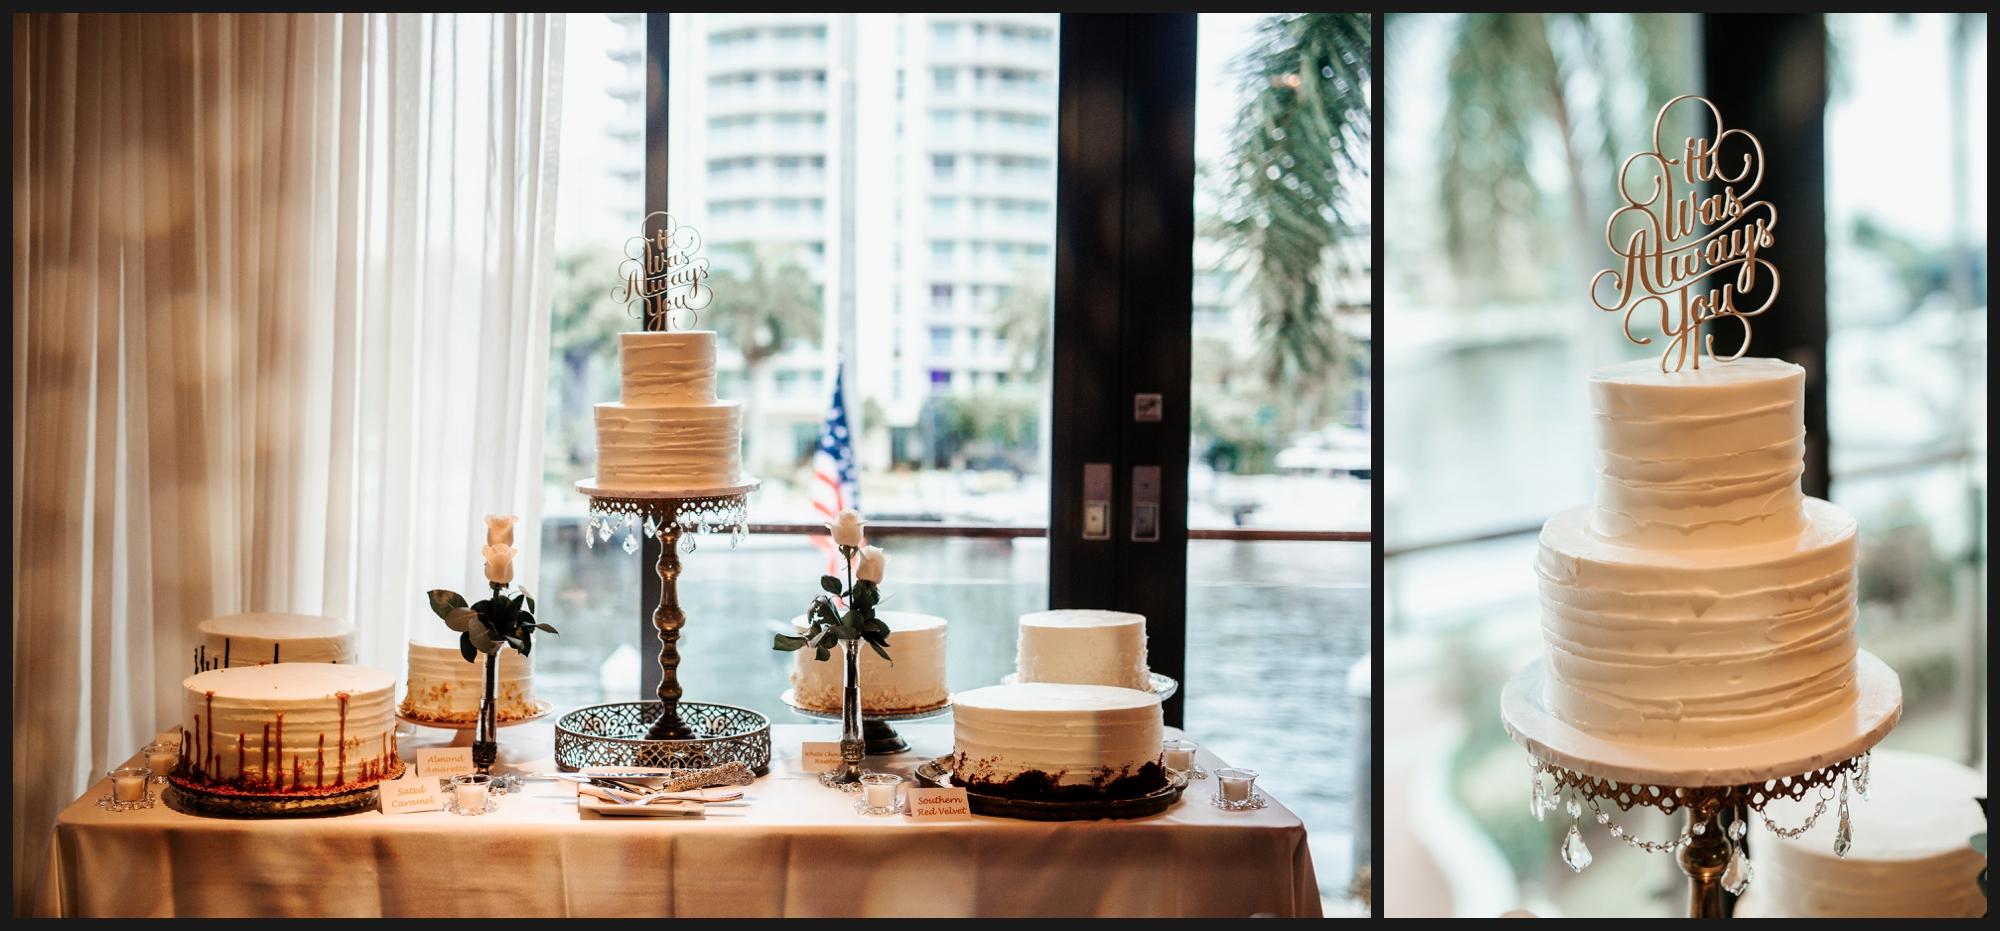 Orlando-Wedding-Photographer-destination-wedding-photographer-florida-wedding-photographer-bohemian-wedding-photographer_0013.jpg